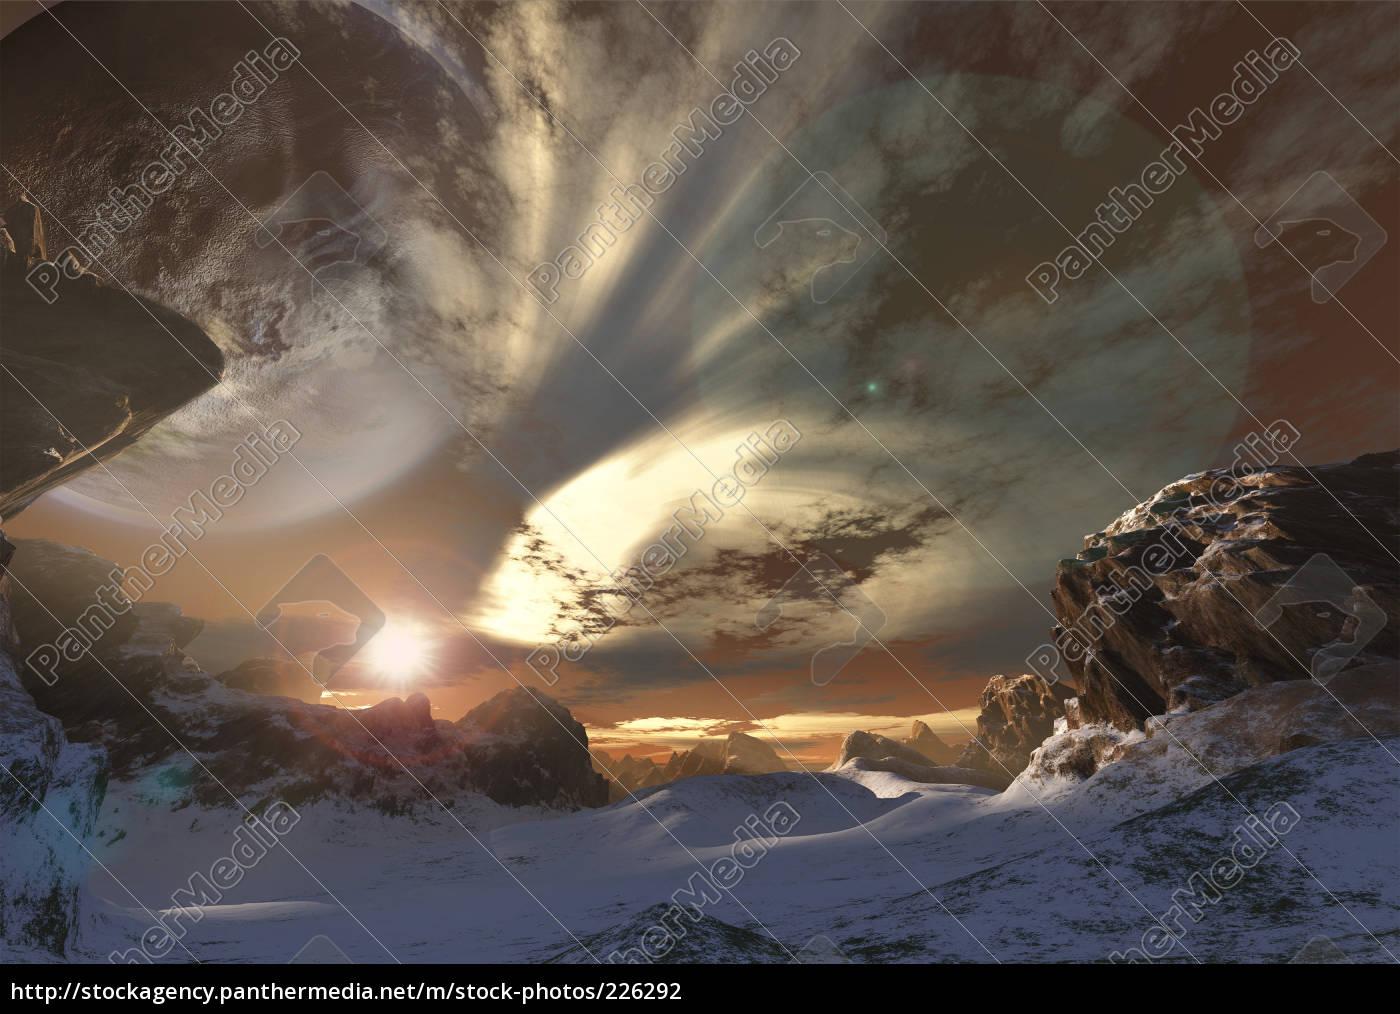 dream, of, the, last, night - 226292